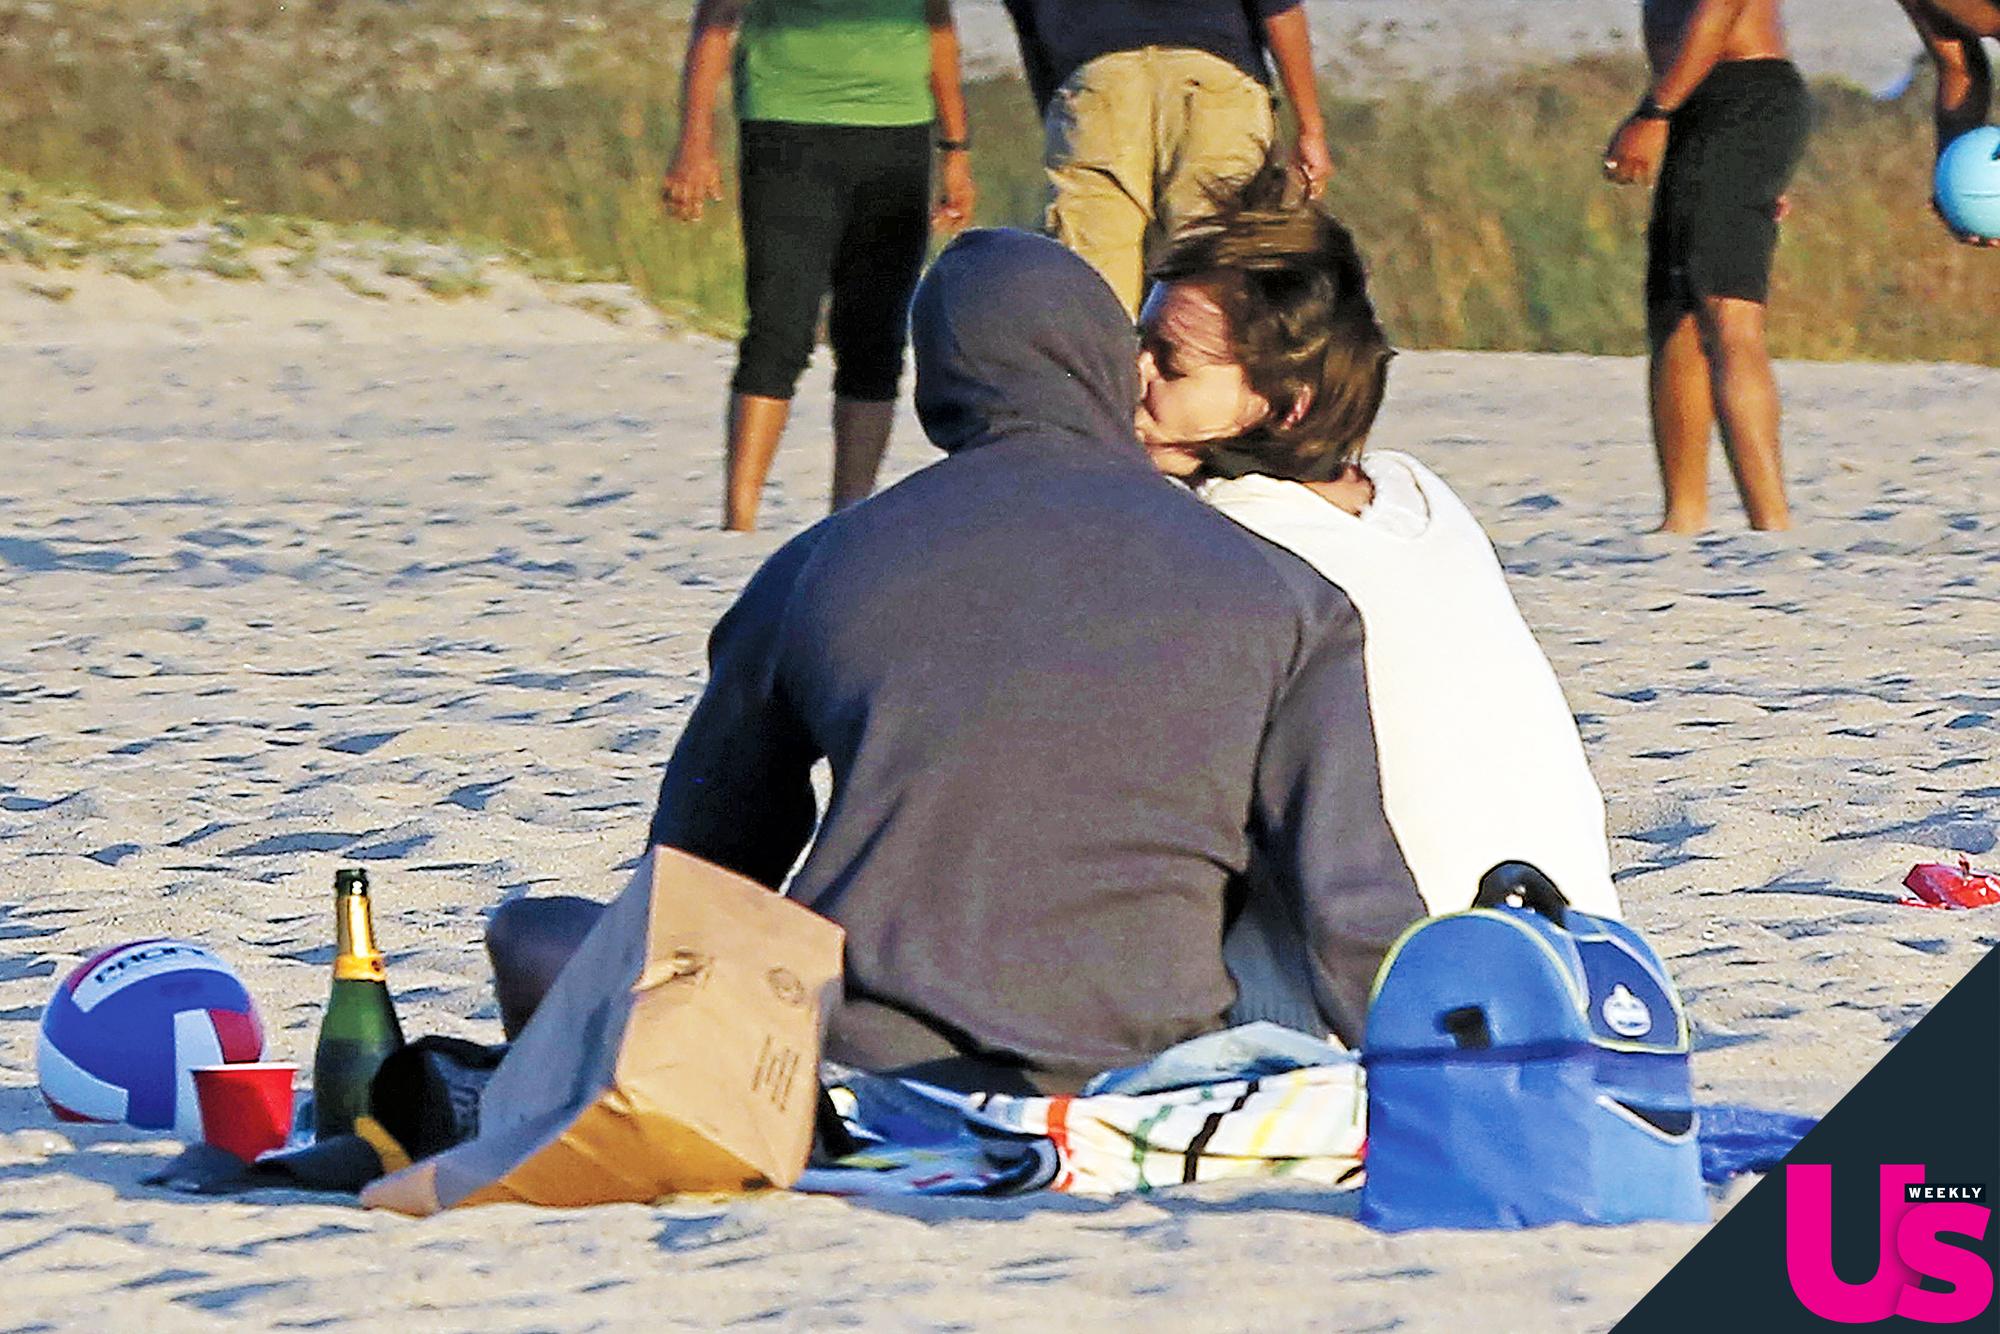 Beach allies love bare banging